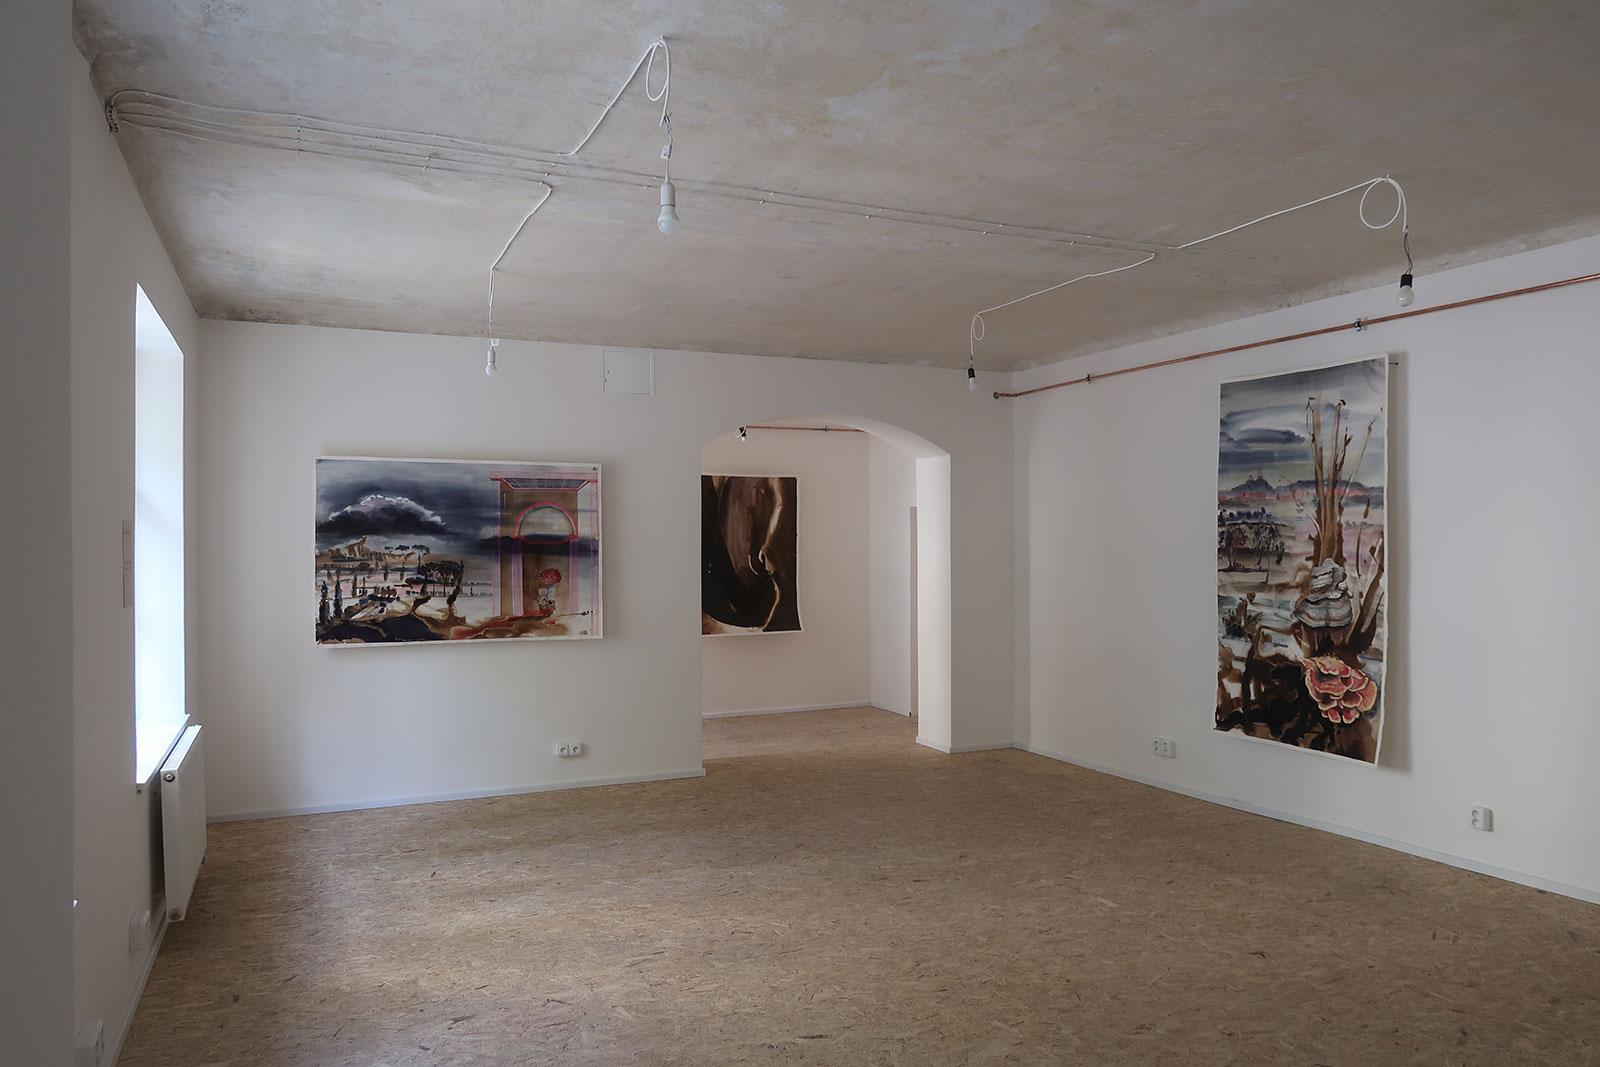 Výstava obrazů Marie Ladrové